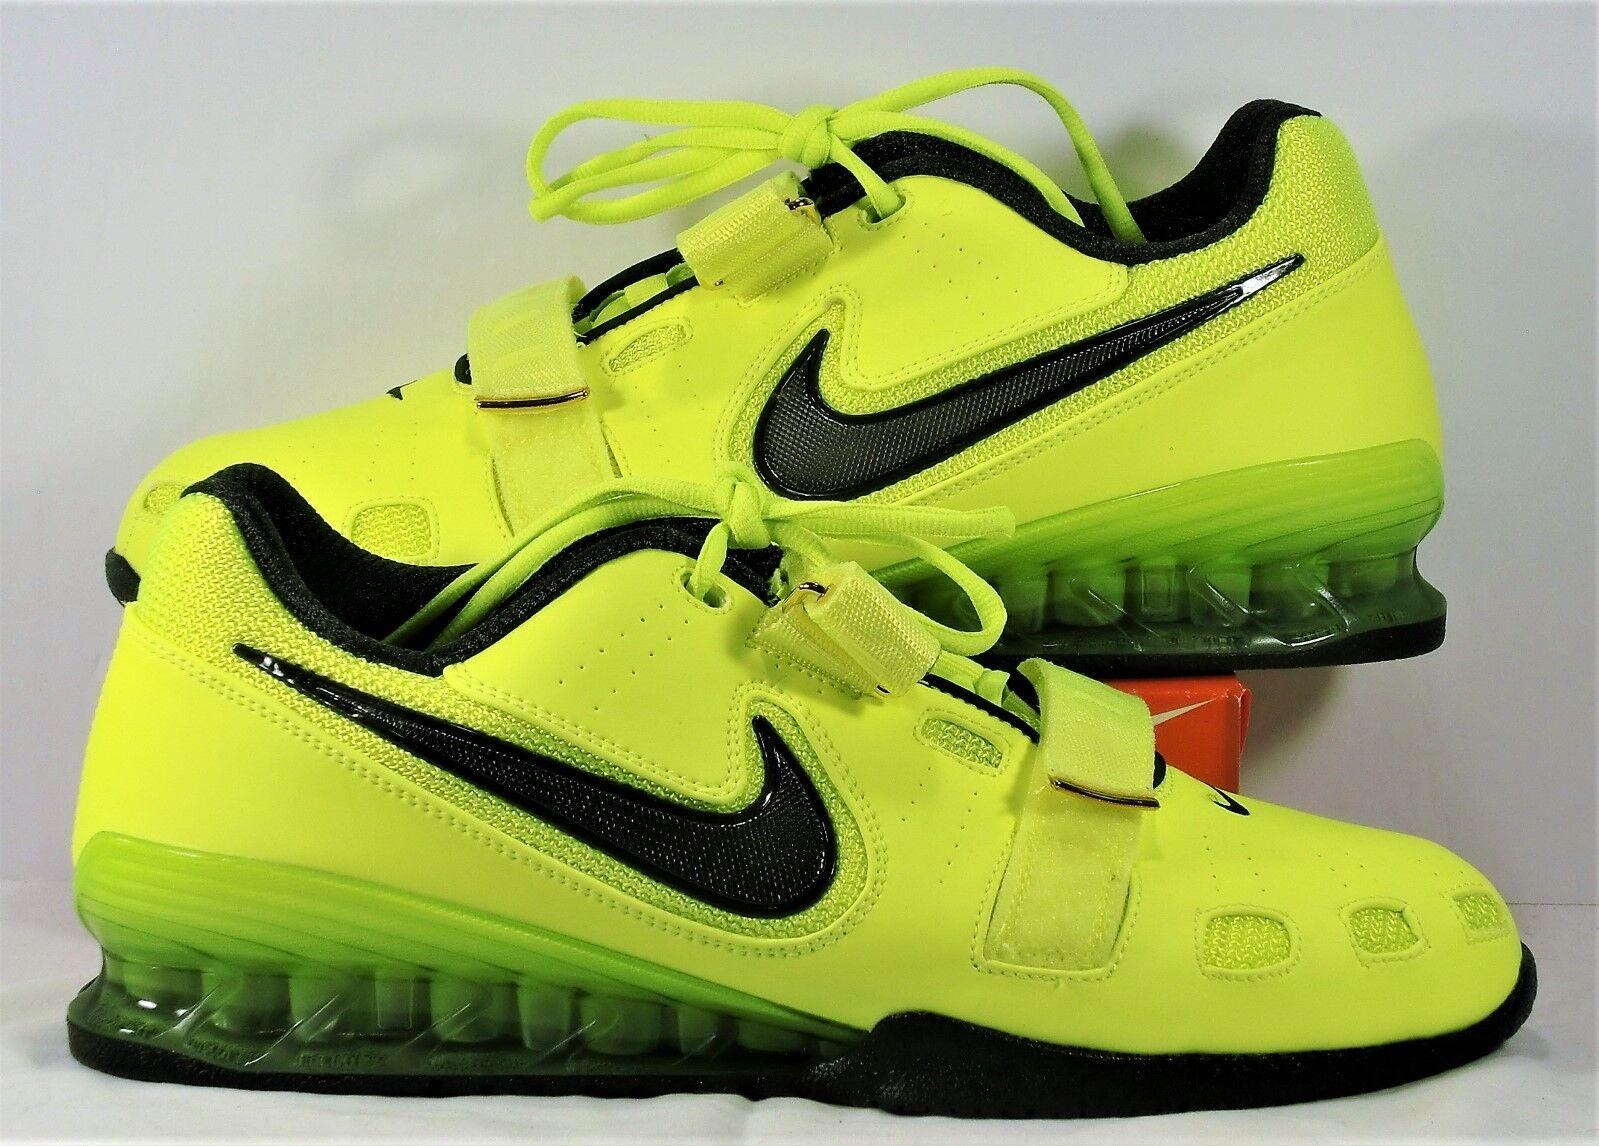 Nike Romaleos 2 Nero & Volt Training Weightlifting Shoes Sz 14 NEW 476927 700